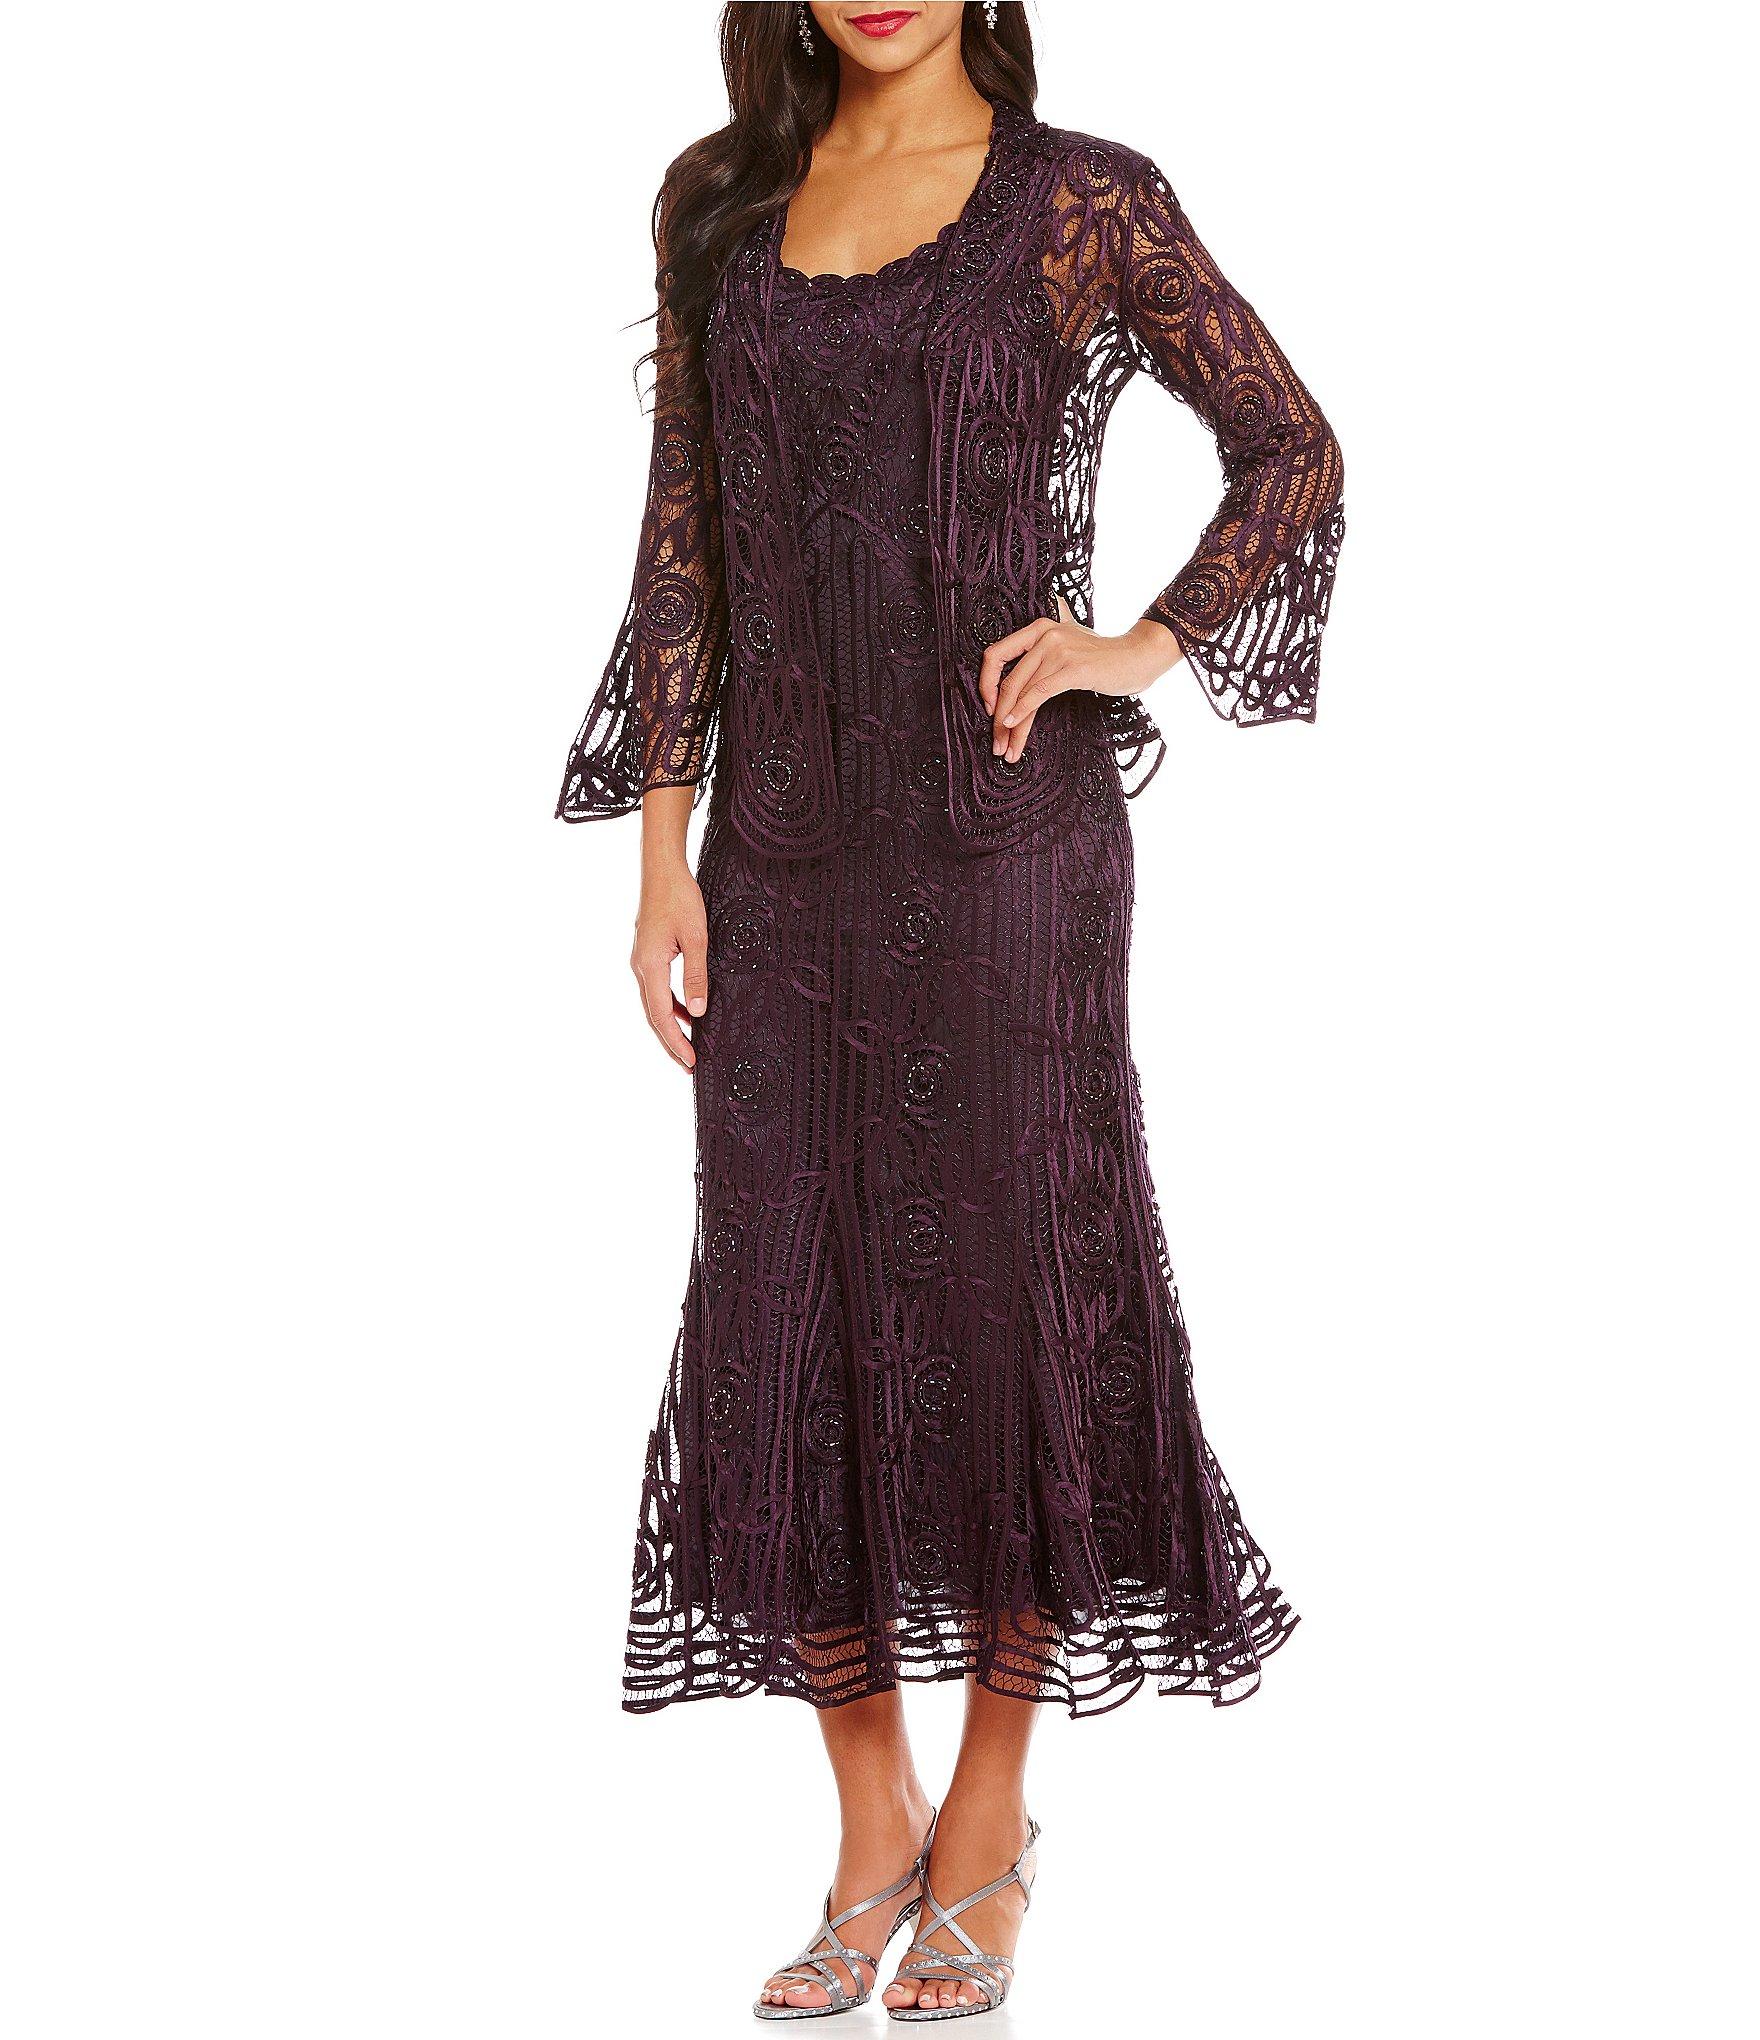 Dillard S Wedding Registry: Soulmates Silk Lace Jacket Dress